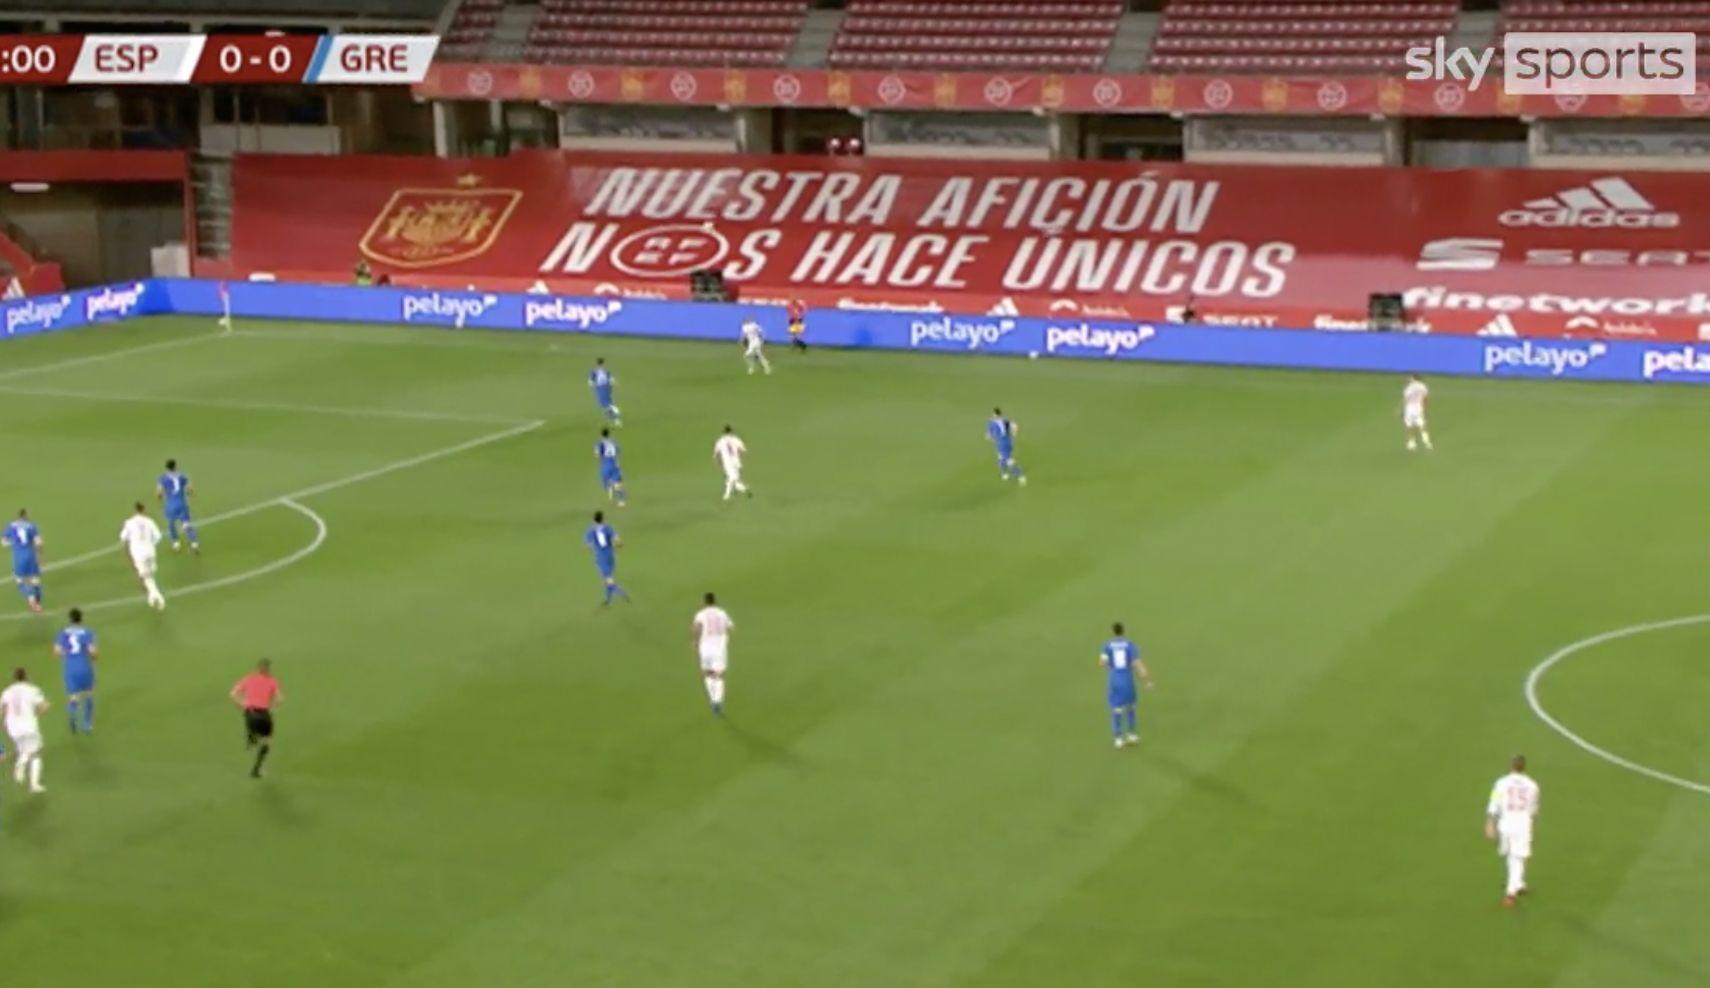 Thiago v Tsimikas: Why Klopp will be happy with Spain v Greece draw